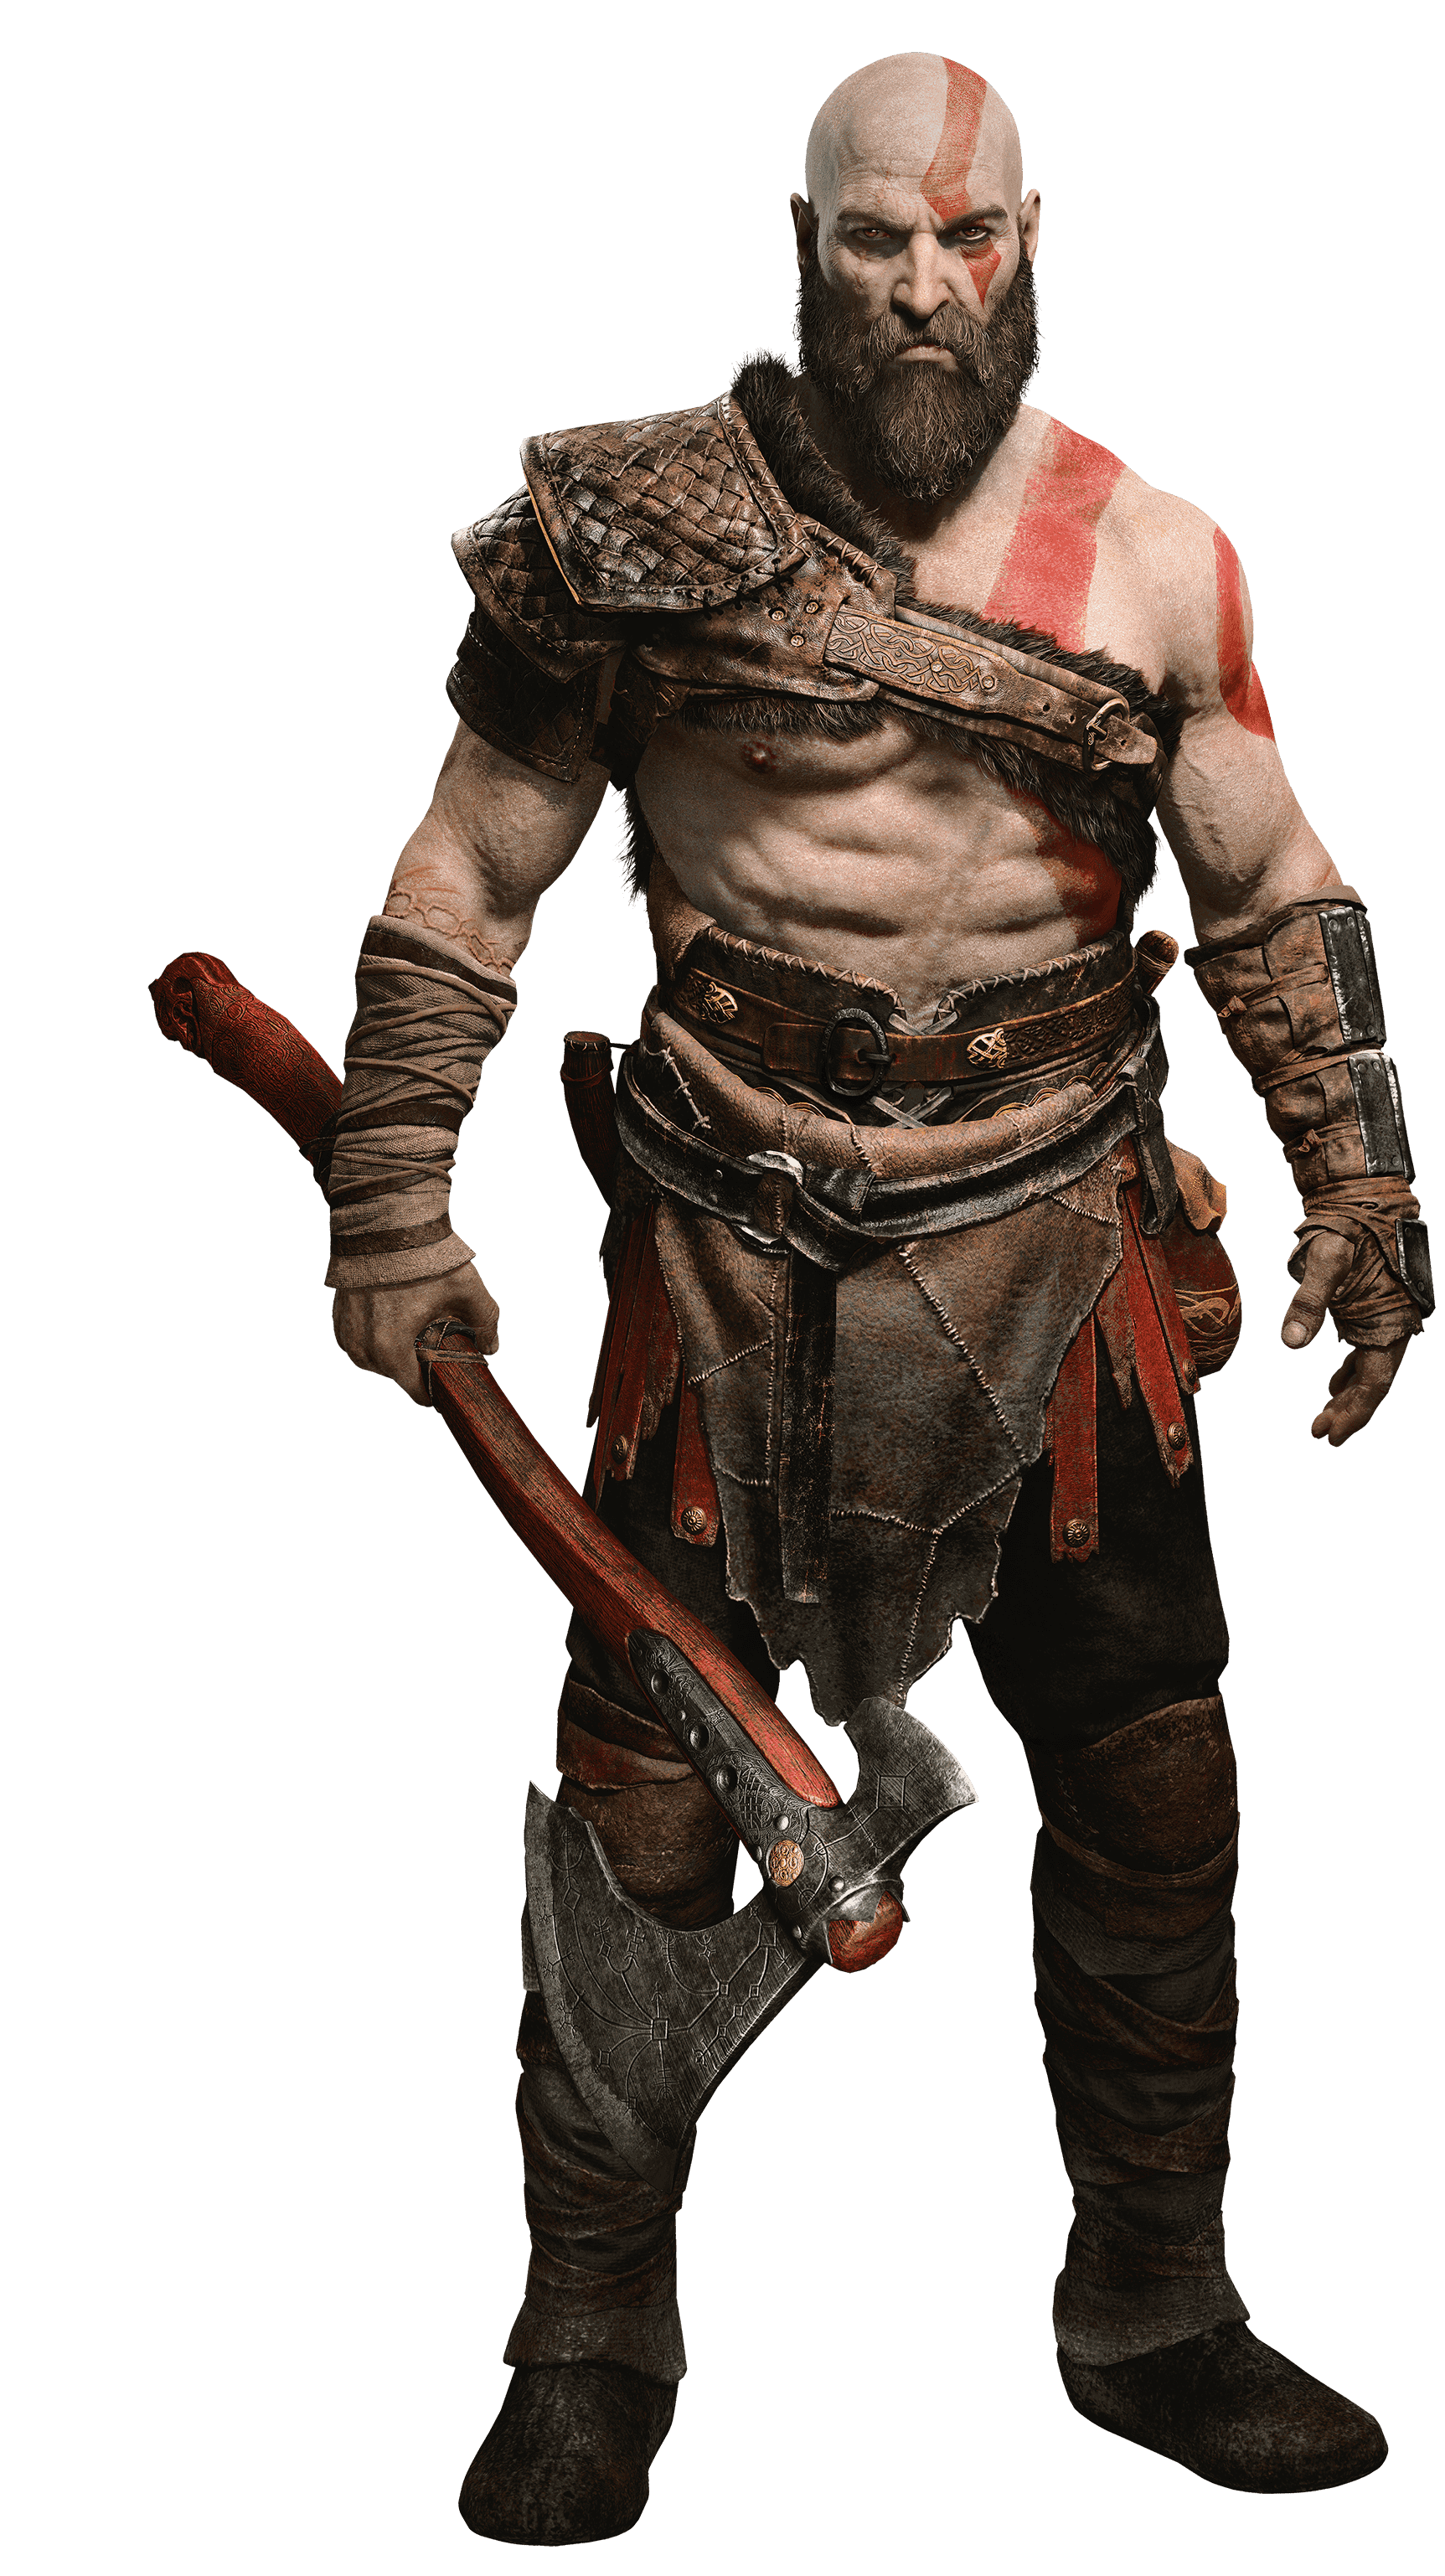 Archivo:Kratos.png